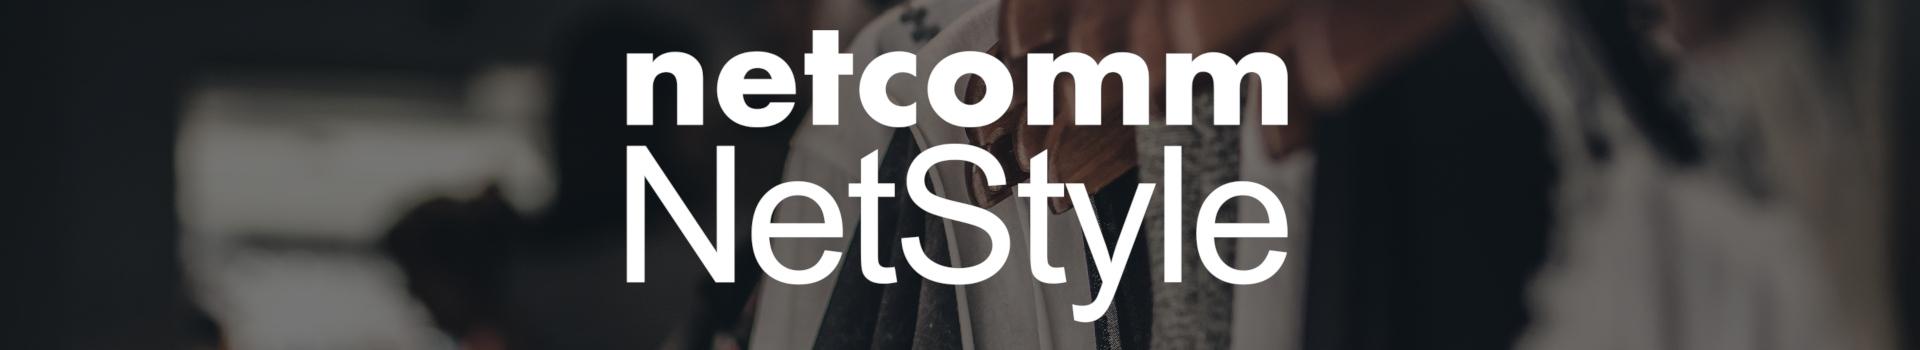 NetStyle - Incontro del 23 Gennaio 2020